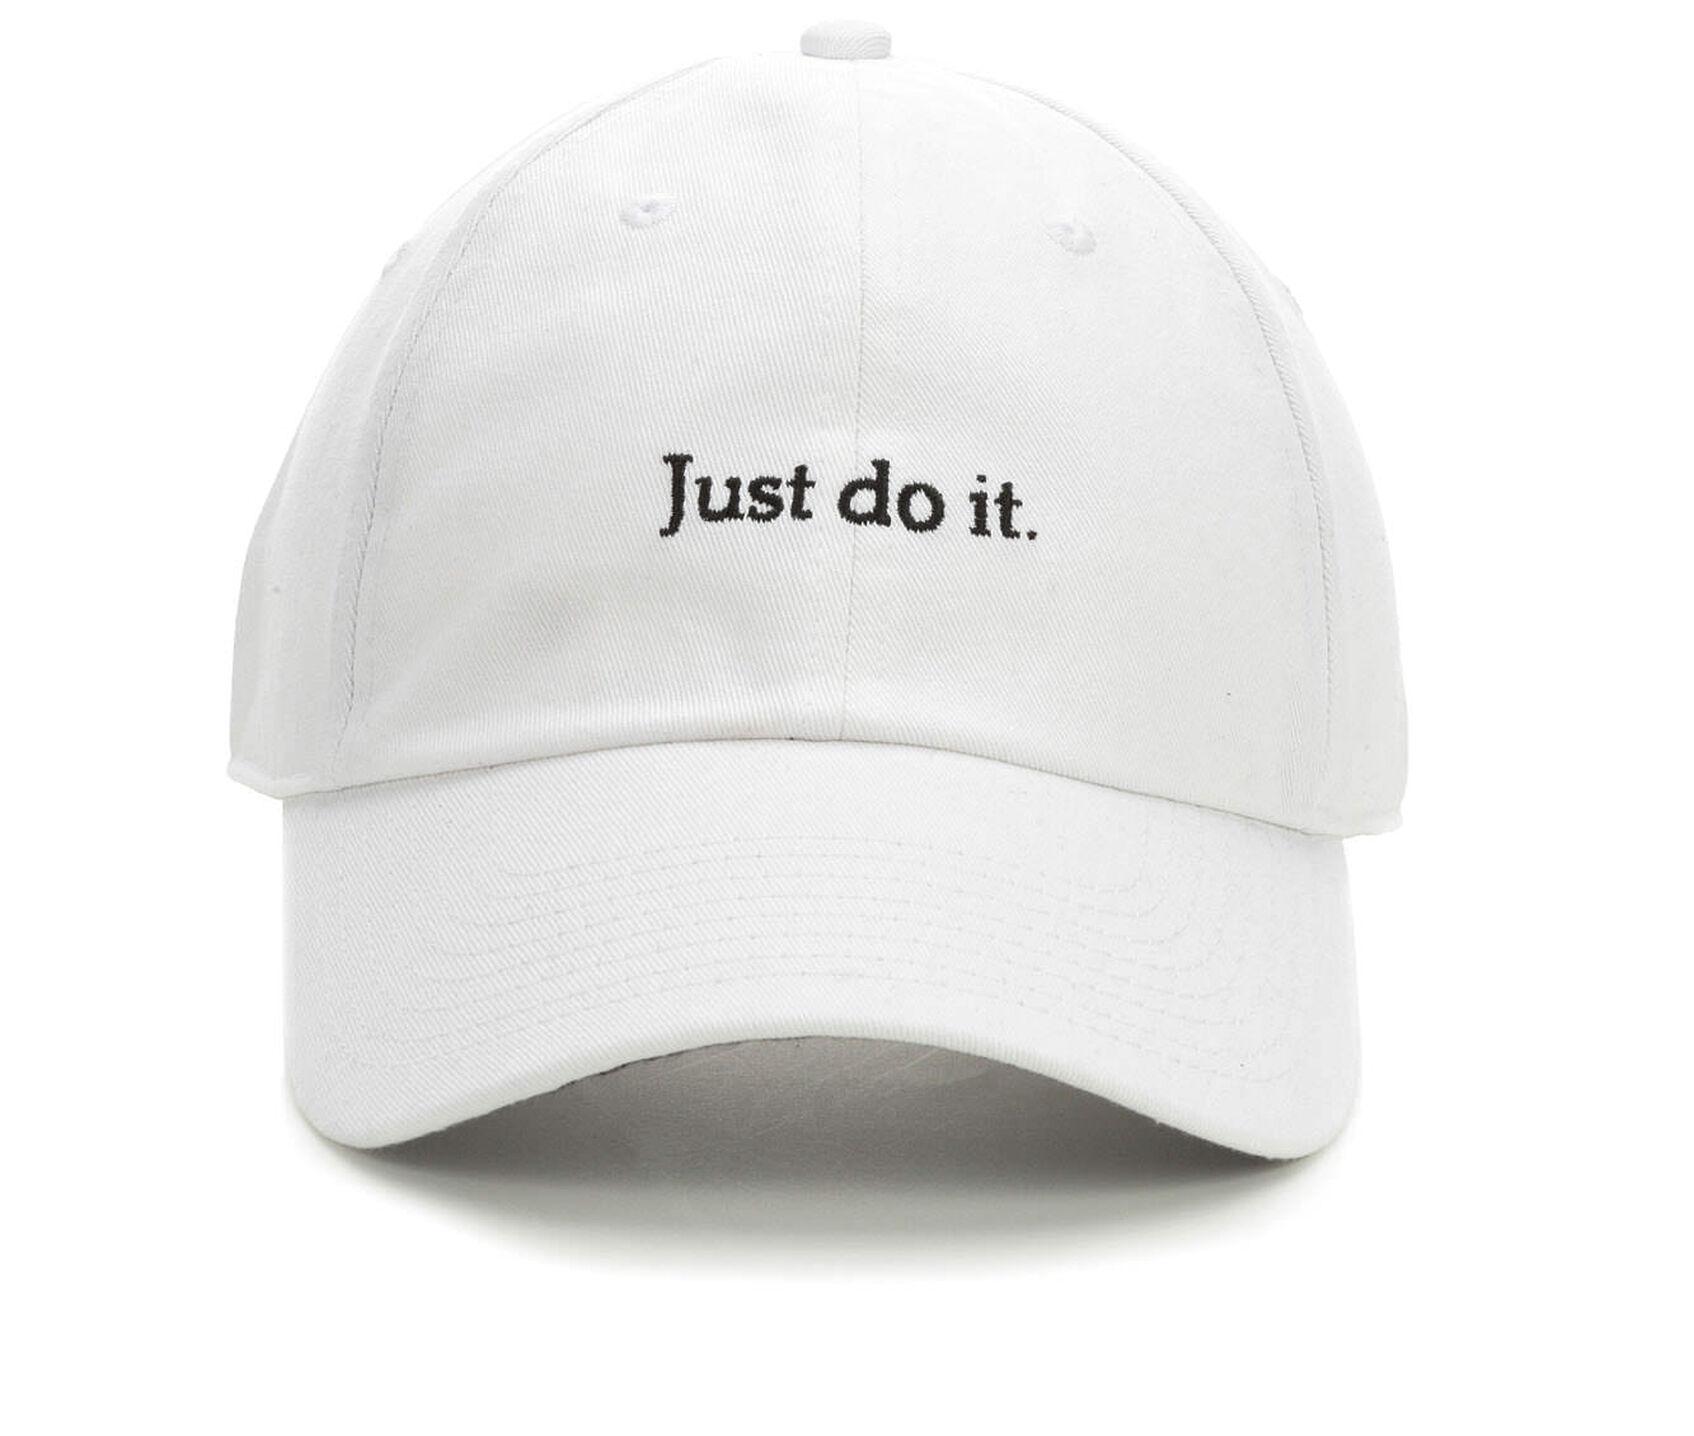 b002c9b258f Nike NSW Just Do It Baseball Cap. Previous